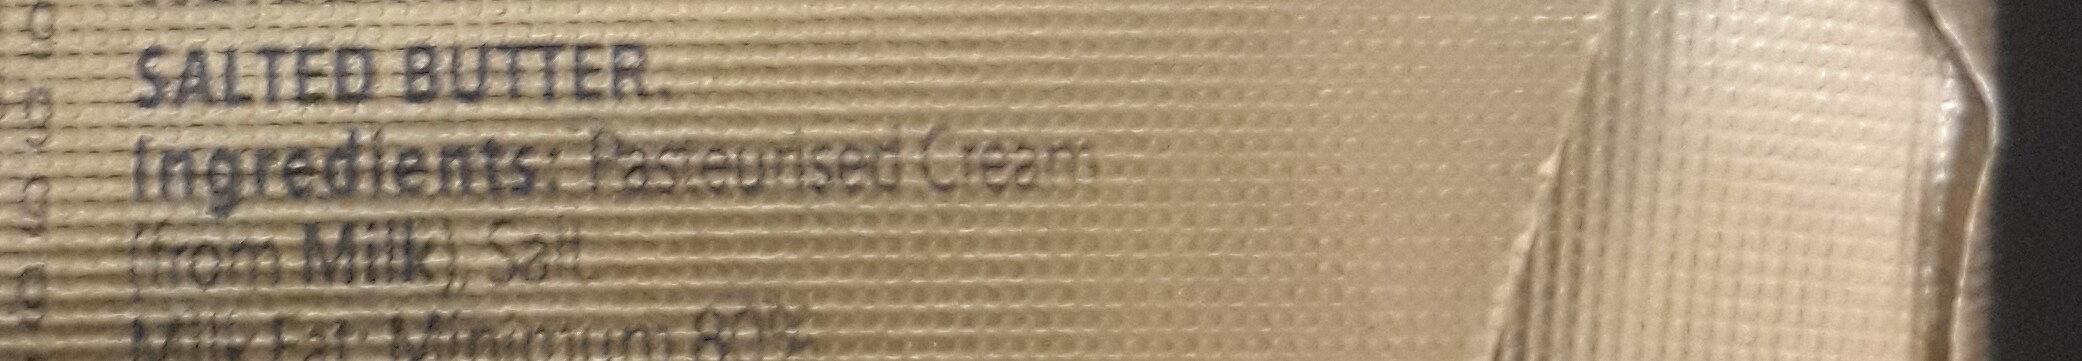 Original Salted Butter - Ingrediënten - en